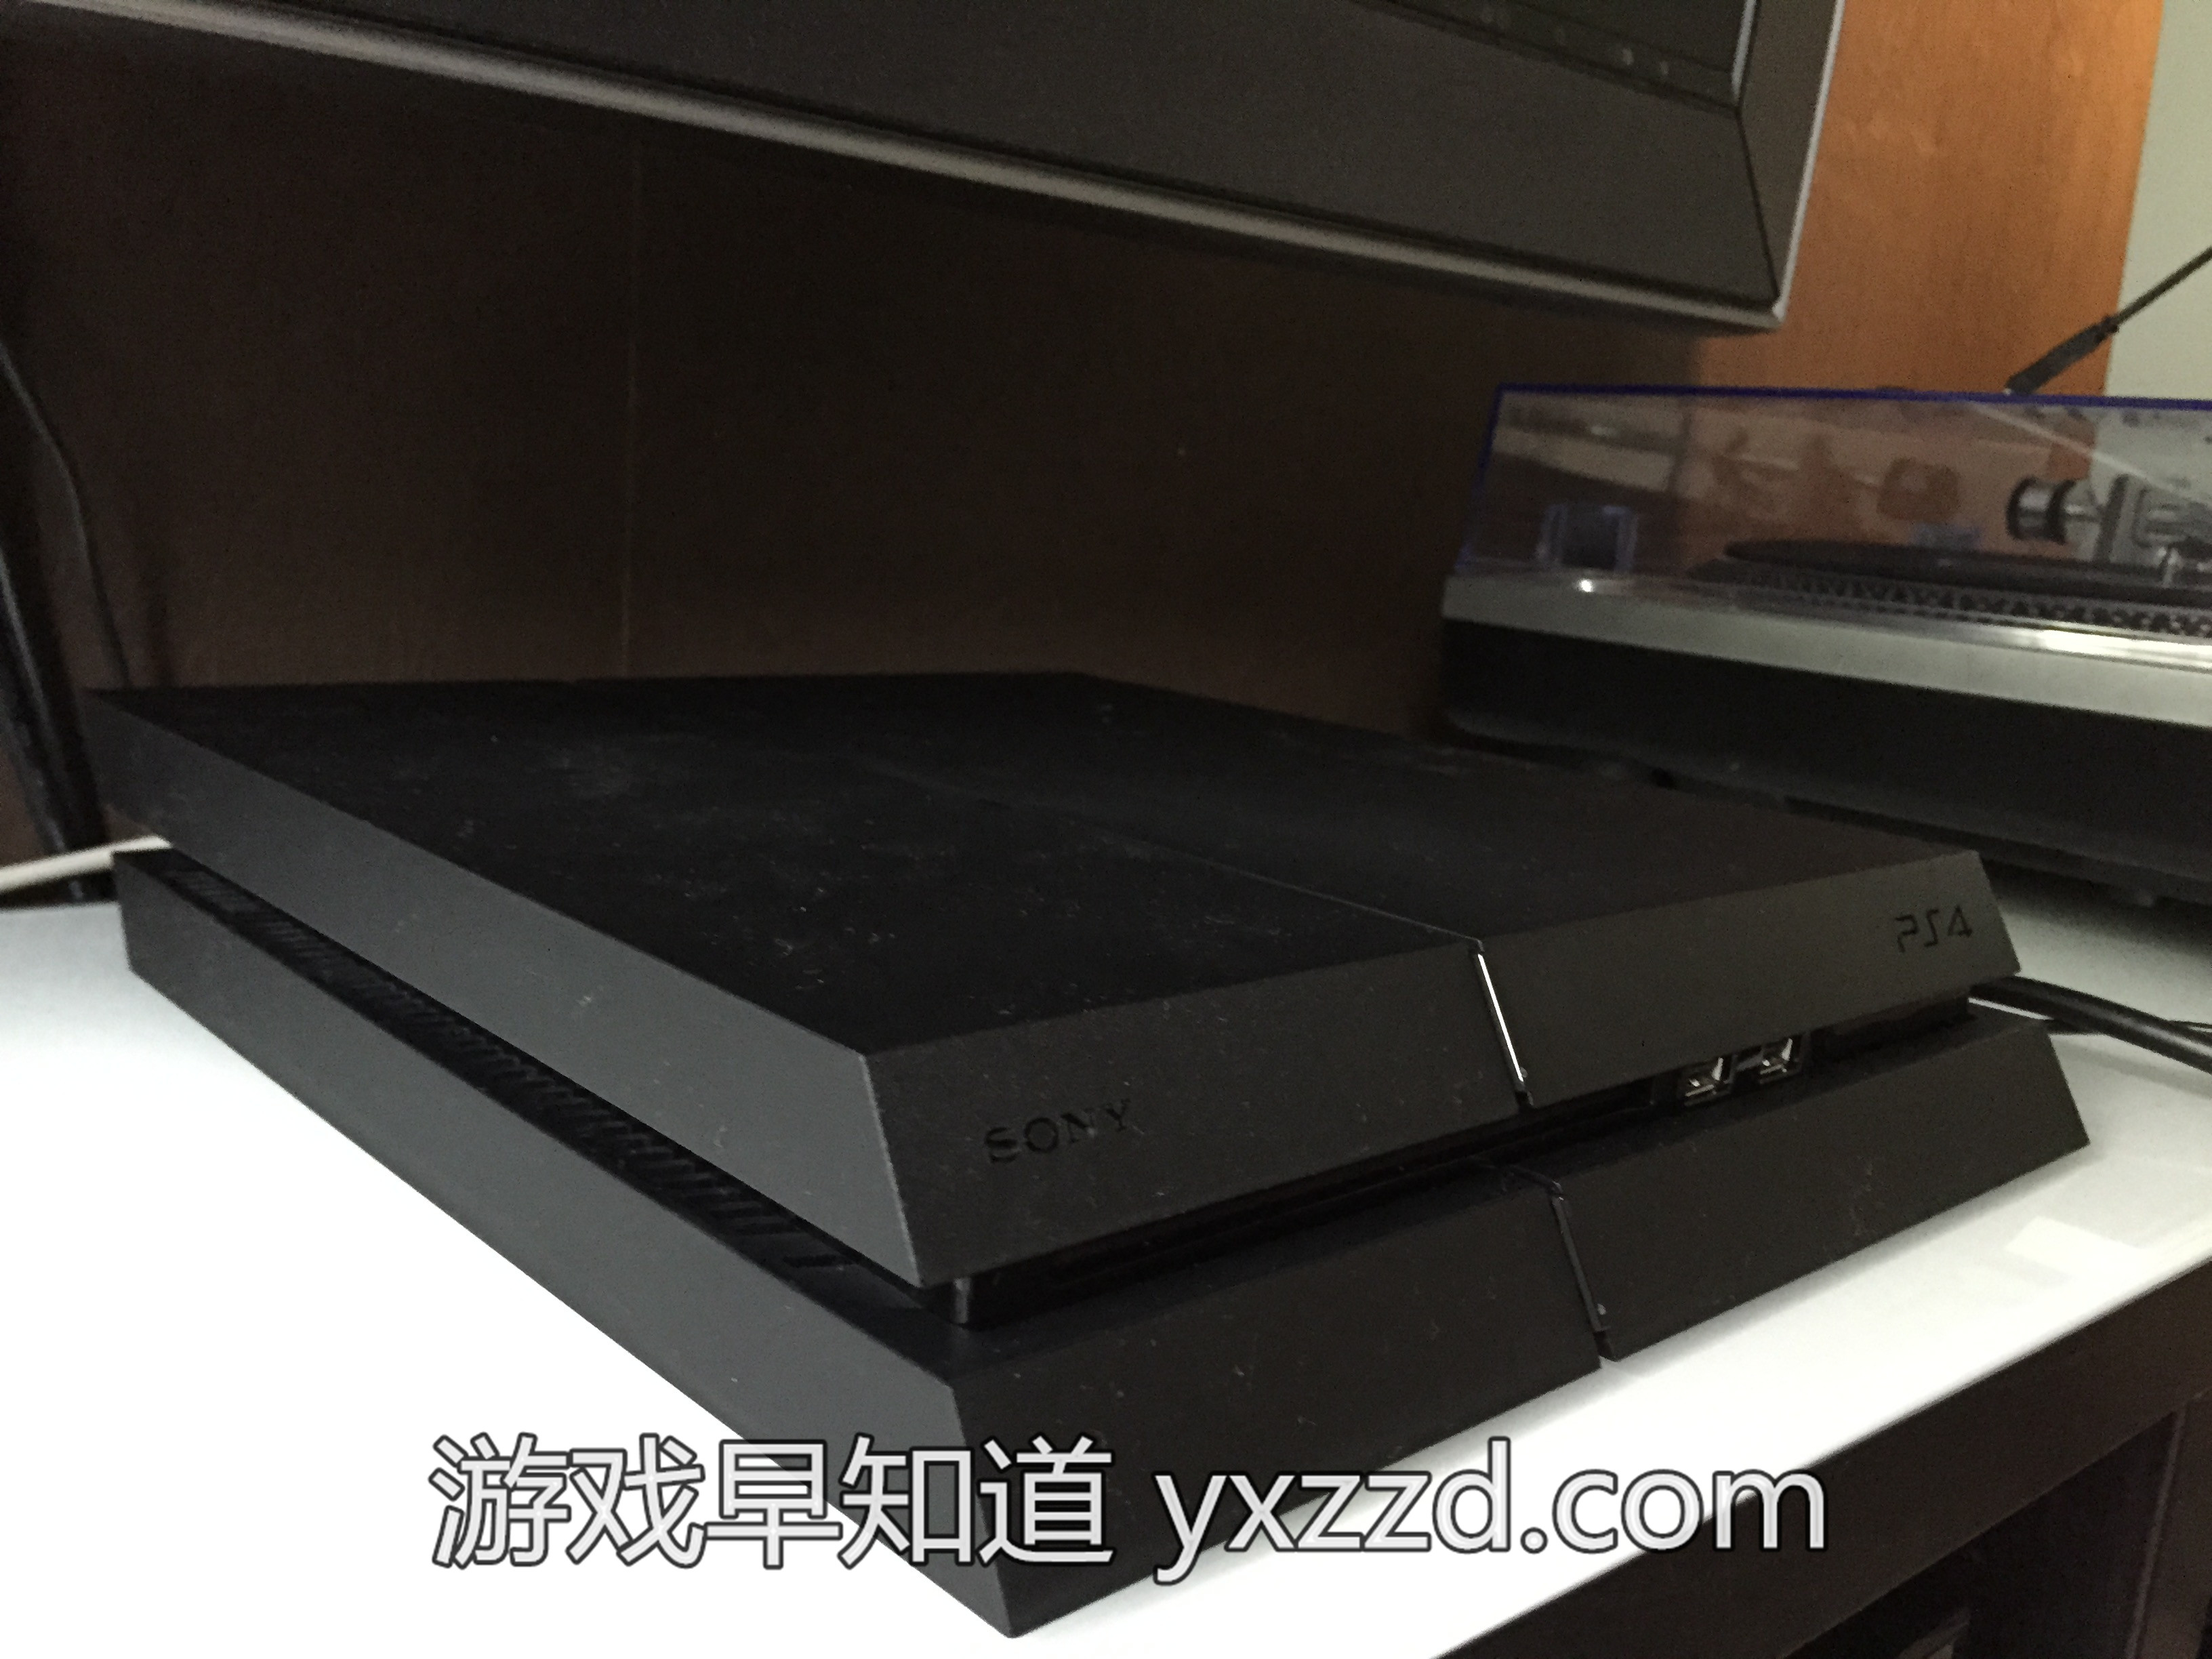 新版1200 PS4主机